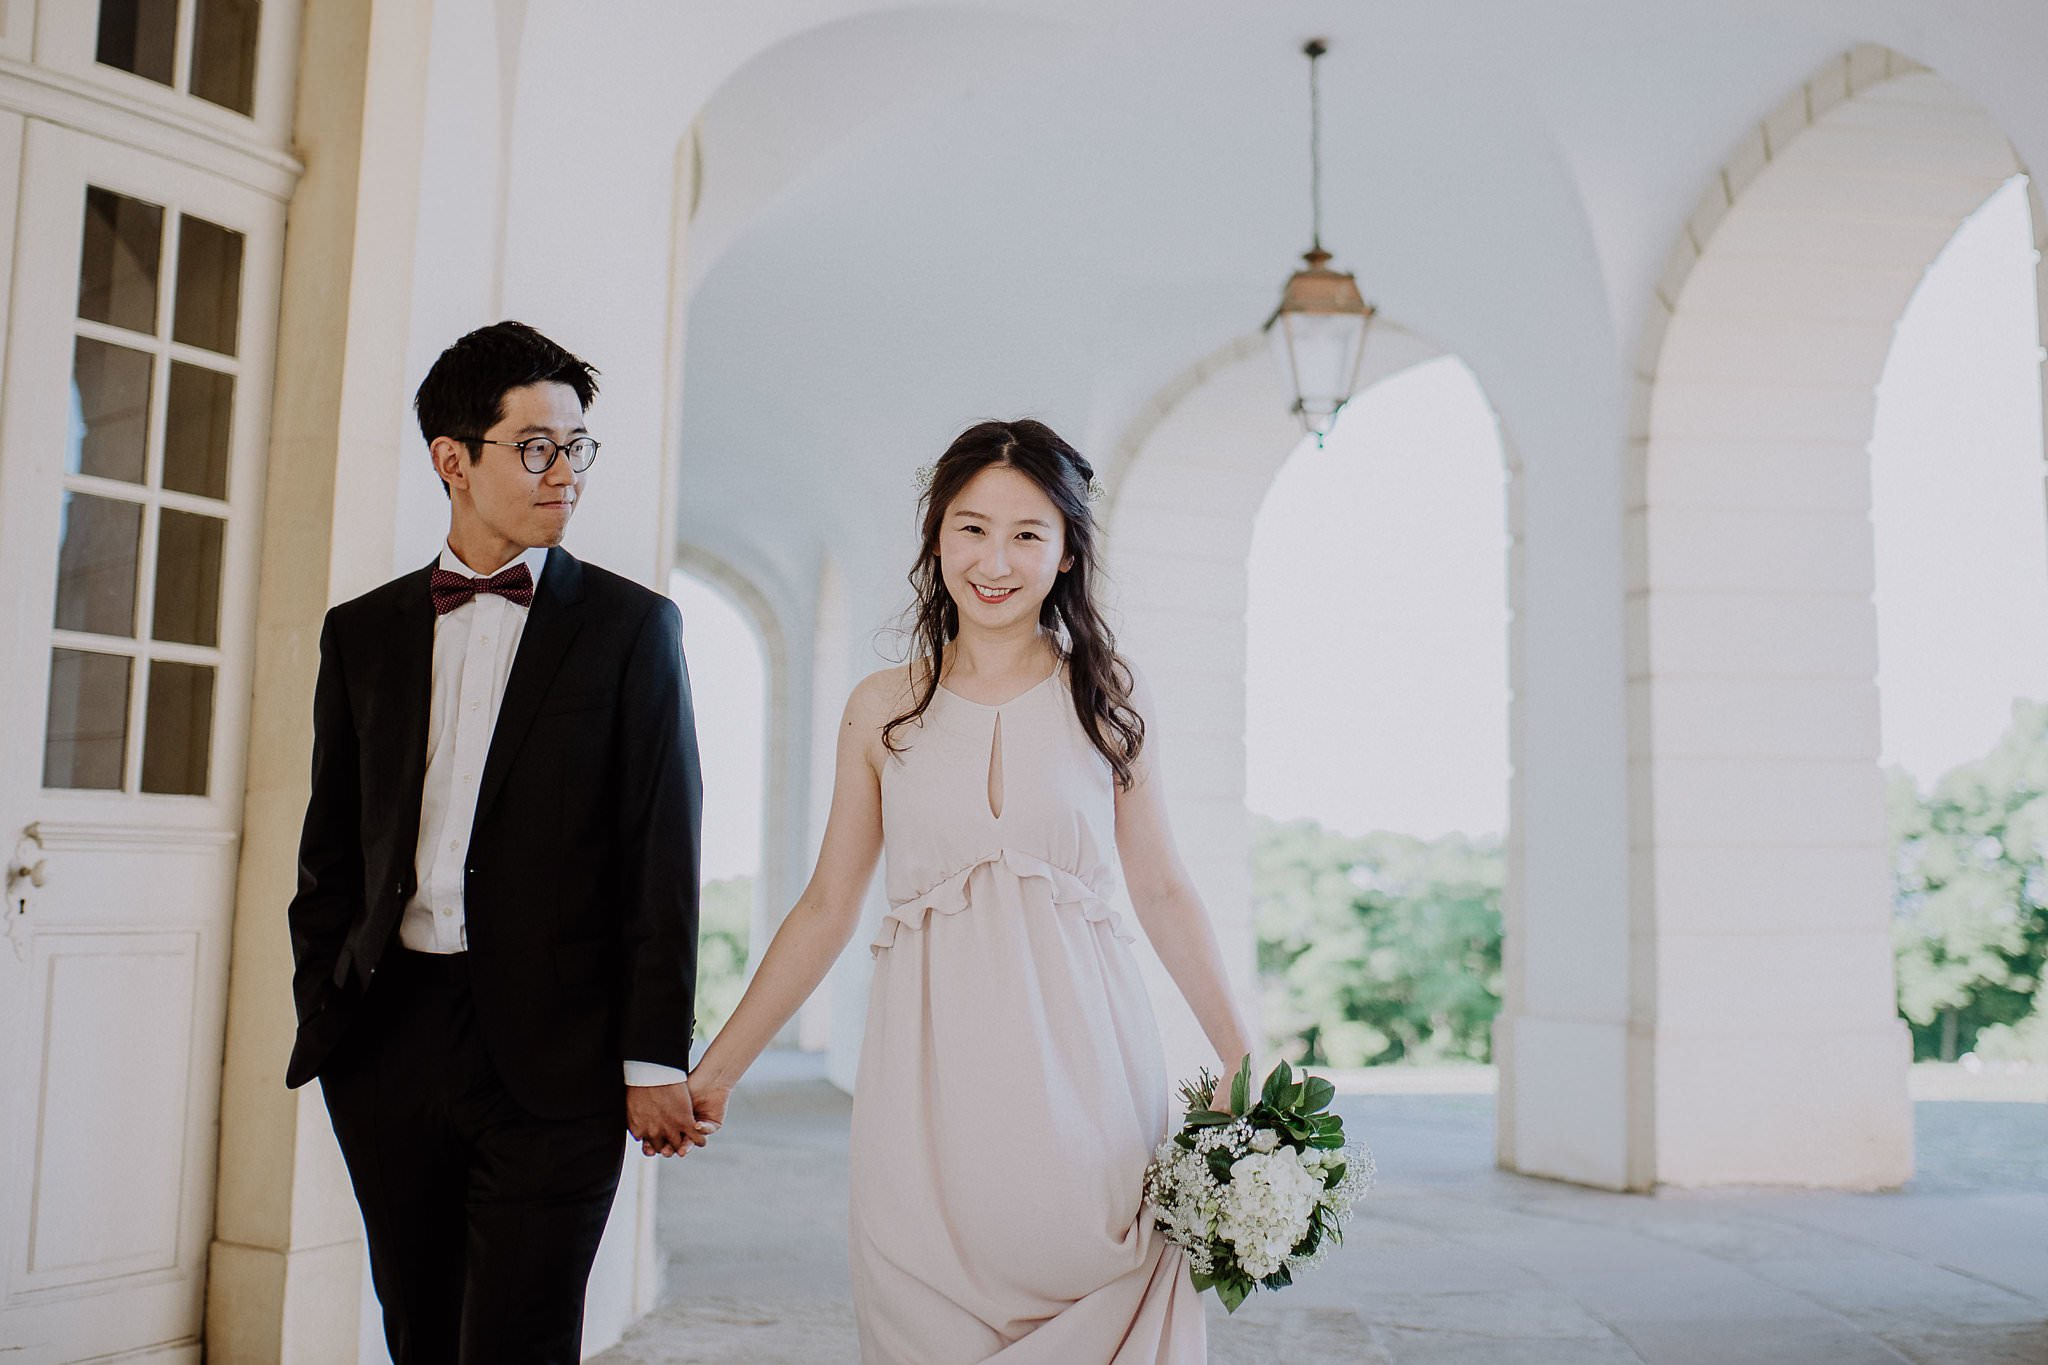 wedding photographer hamilton new zealand 1005 6